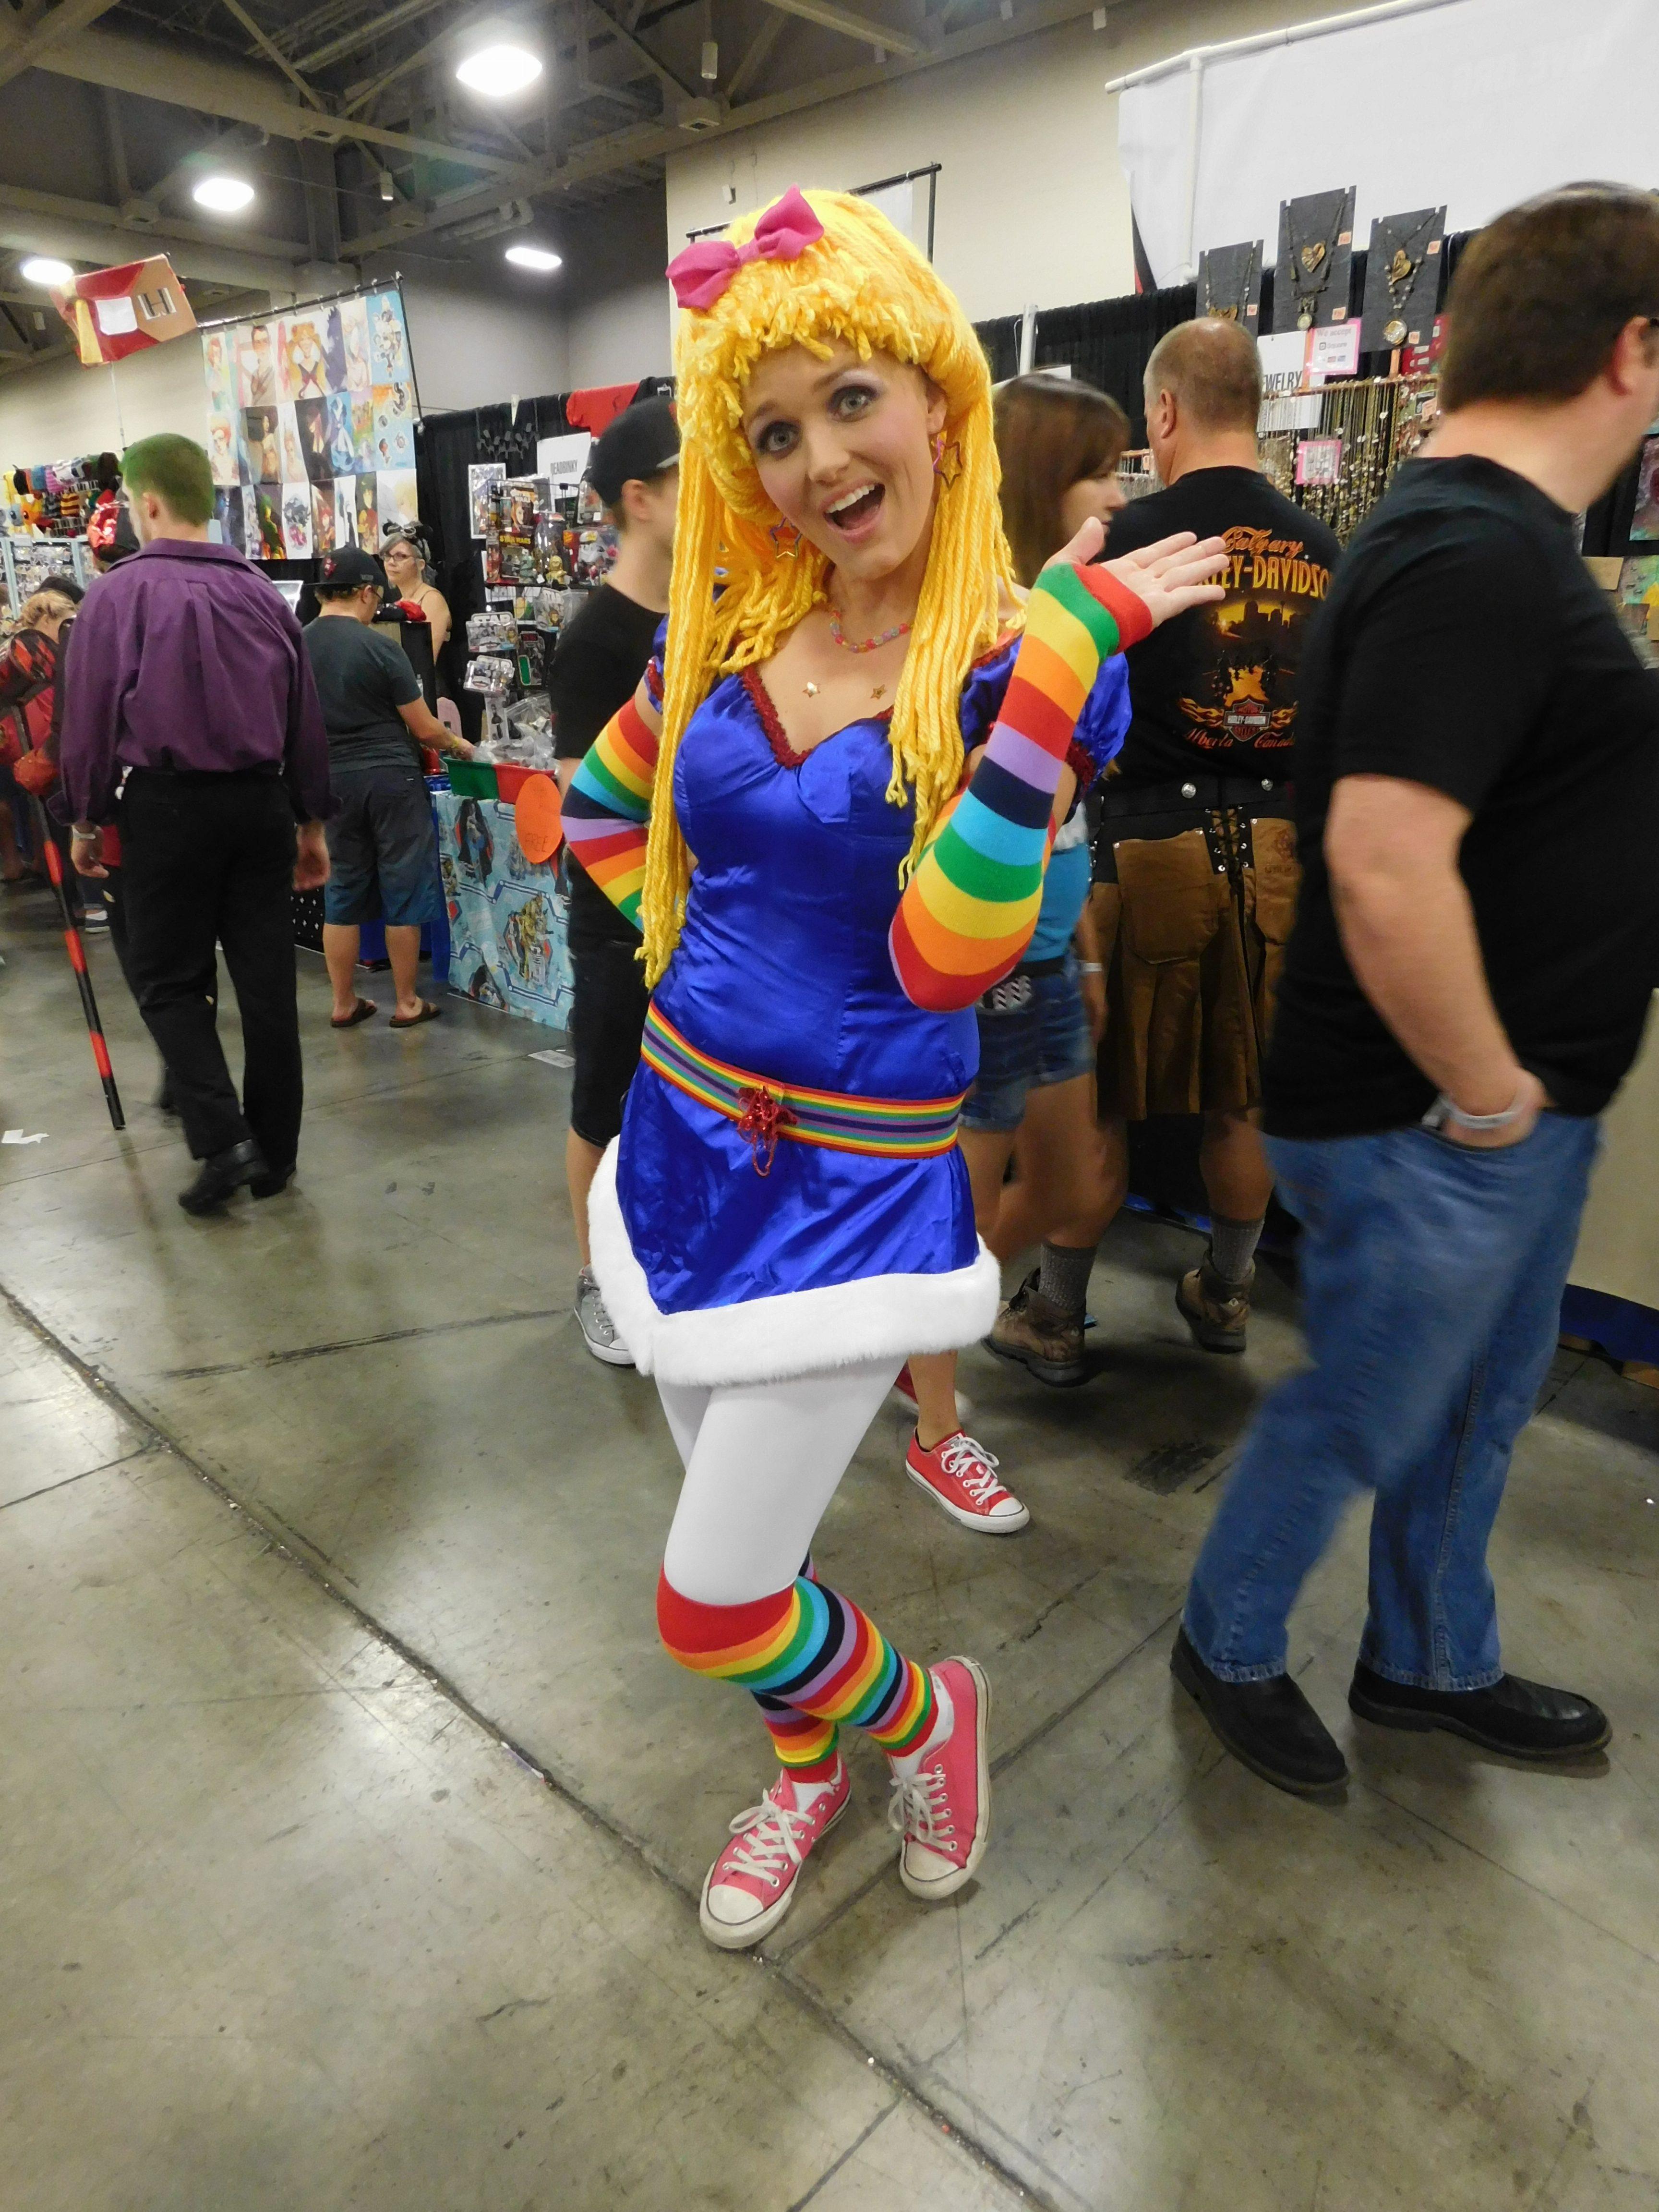 SLCCd3.039 - Rainbow Brite